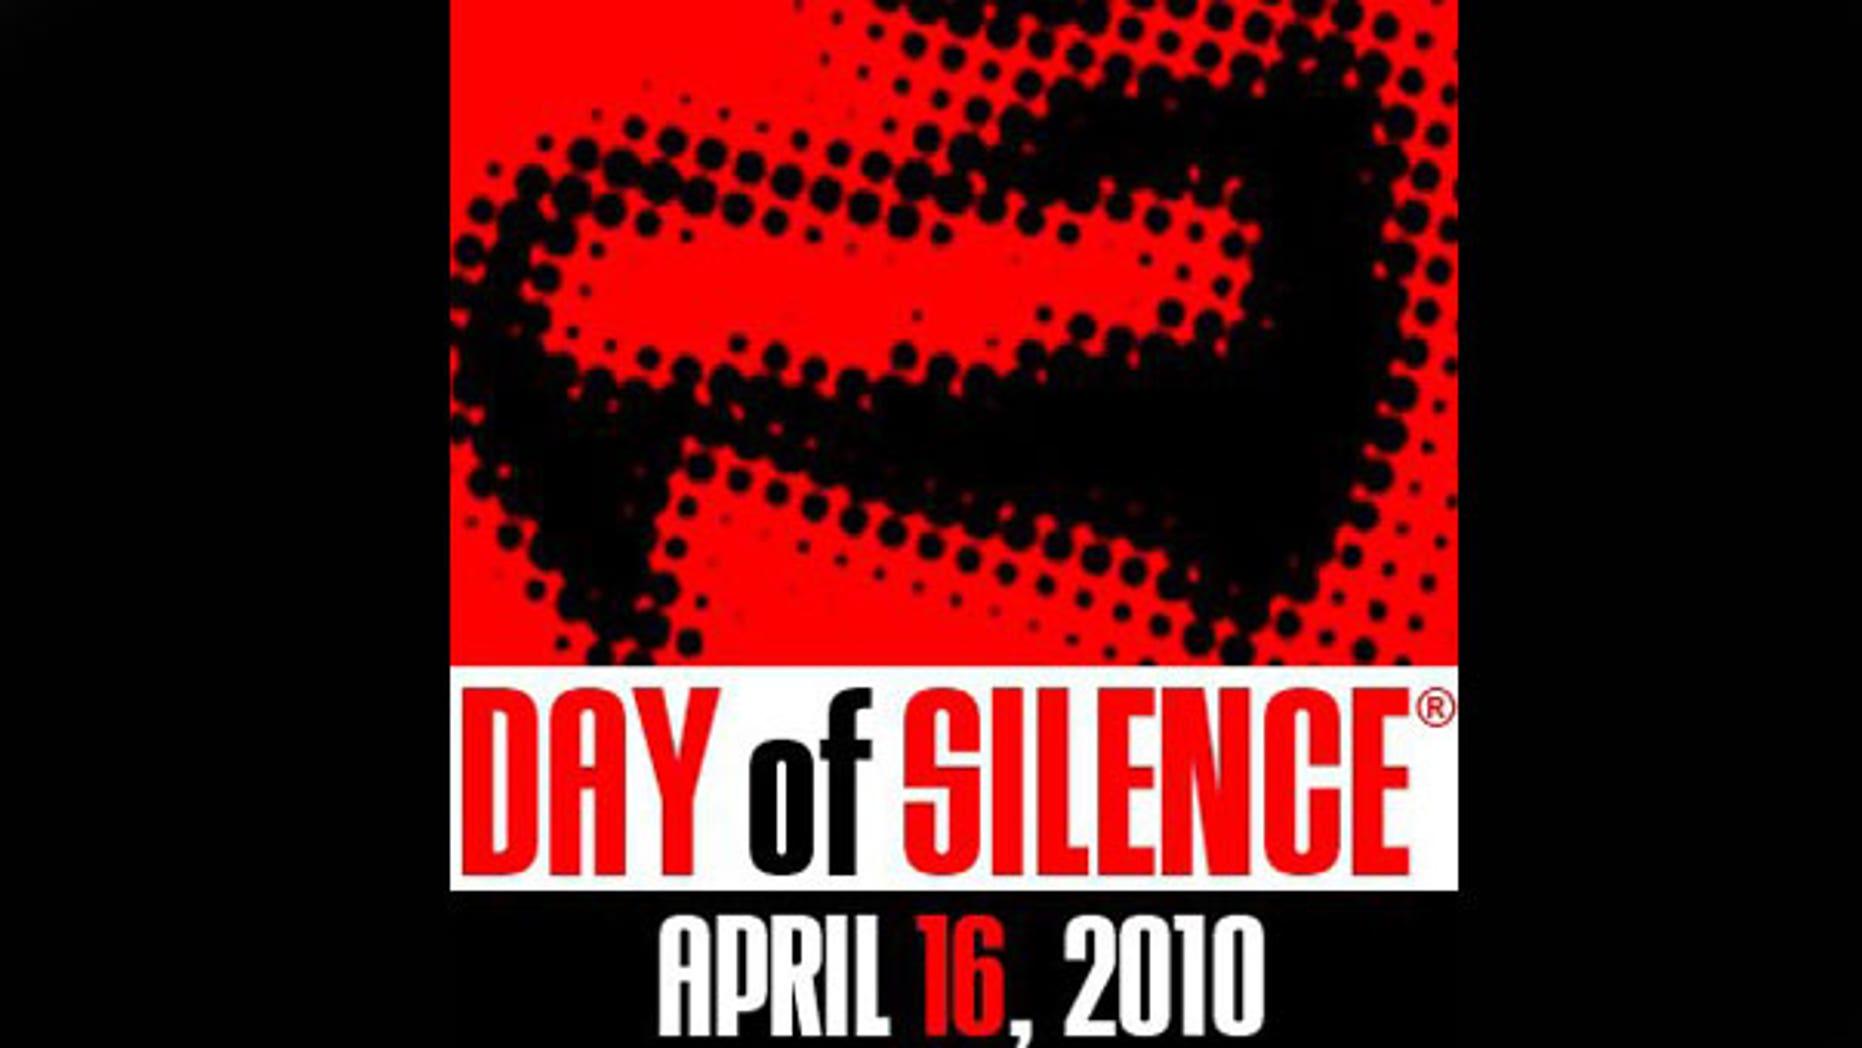 Gay Day of Silence a Waste of Tax Dollars, Critics Say | Fox